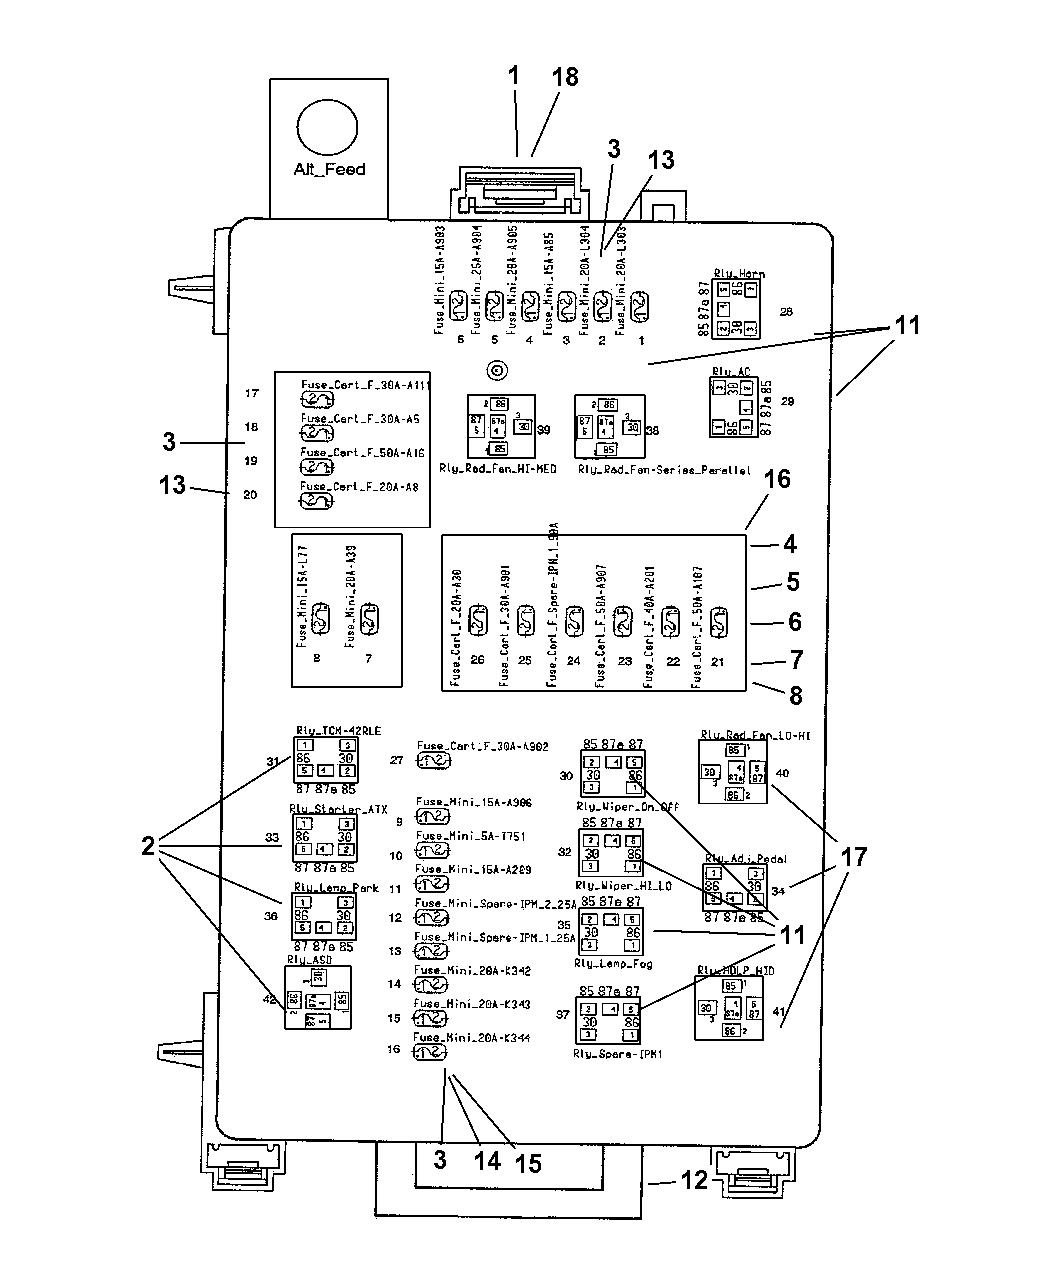 2005 dodge magnum power distribution center relays fuses under hood rh moparpartsgiant com  05 dodge magnum fuse box diagram